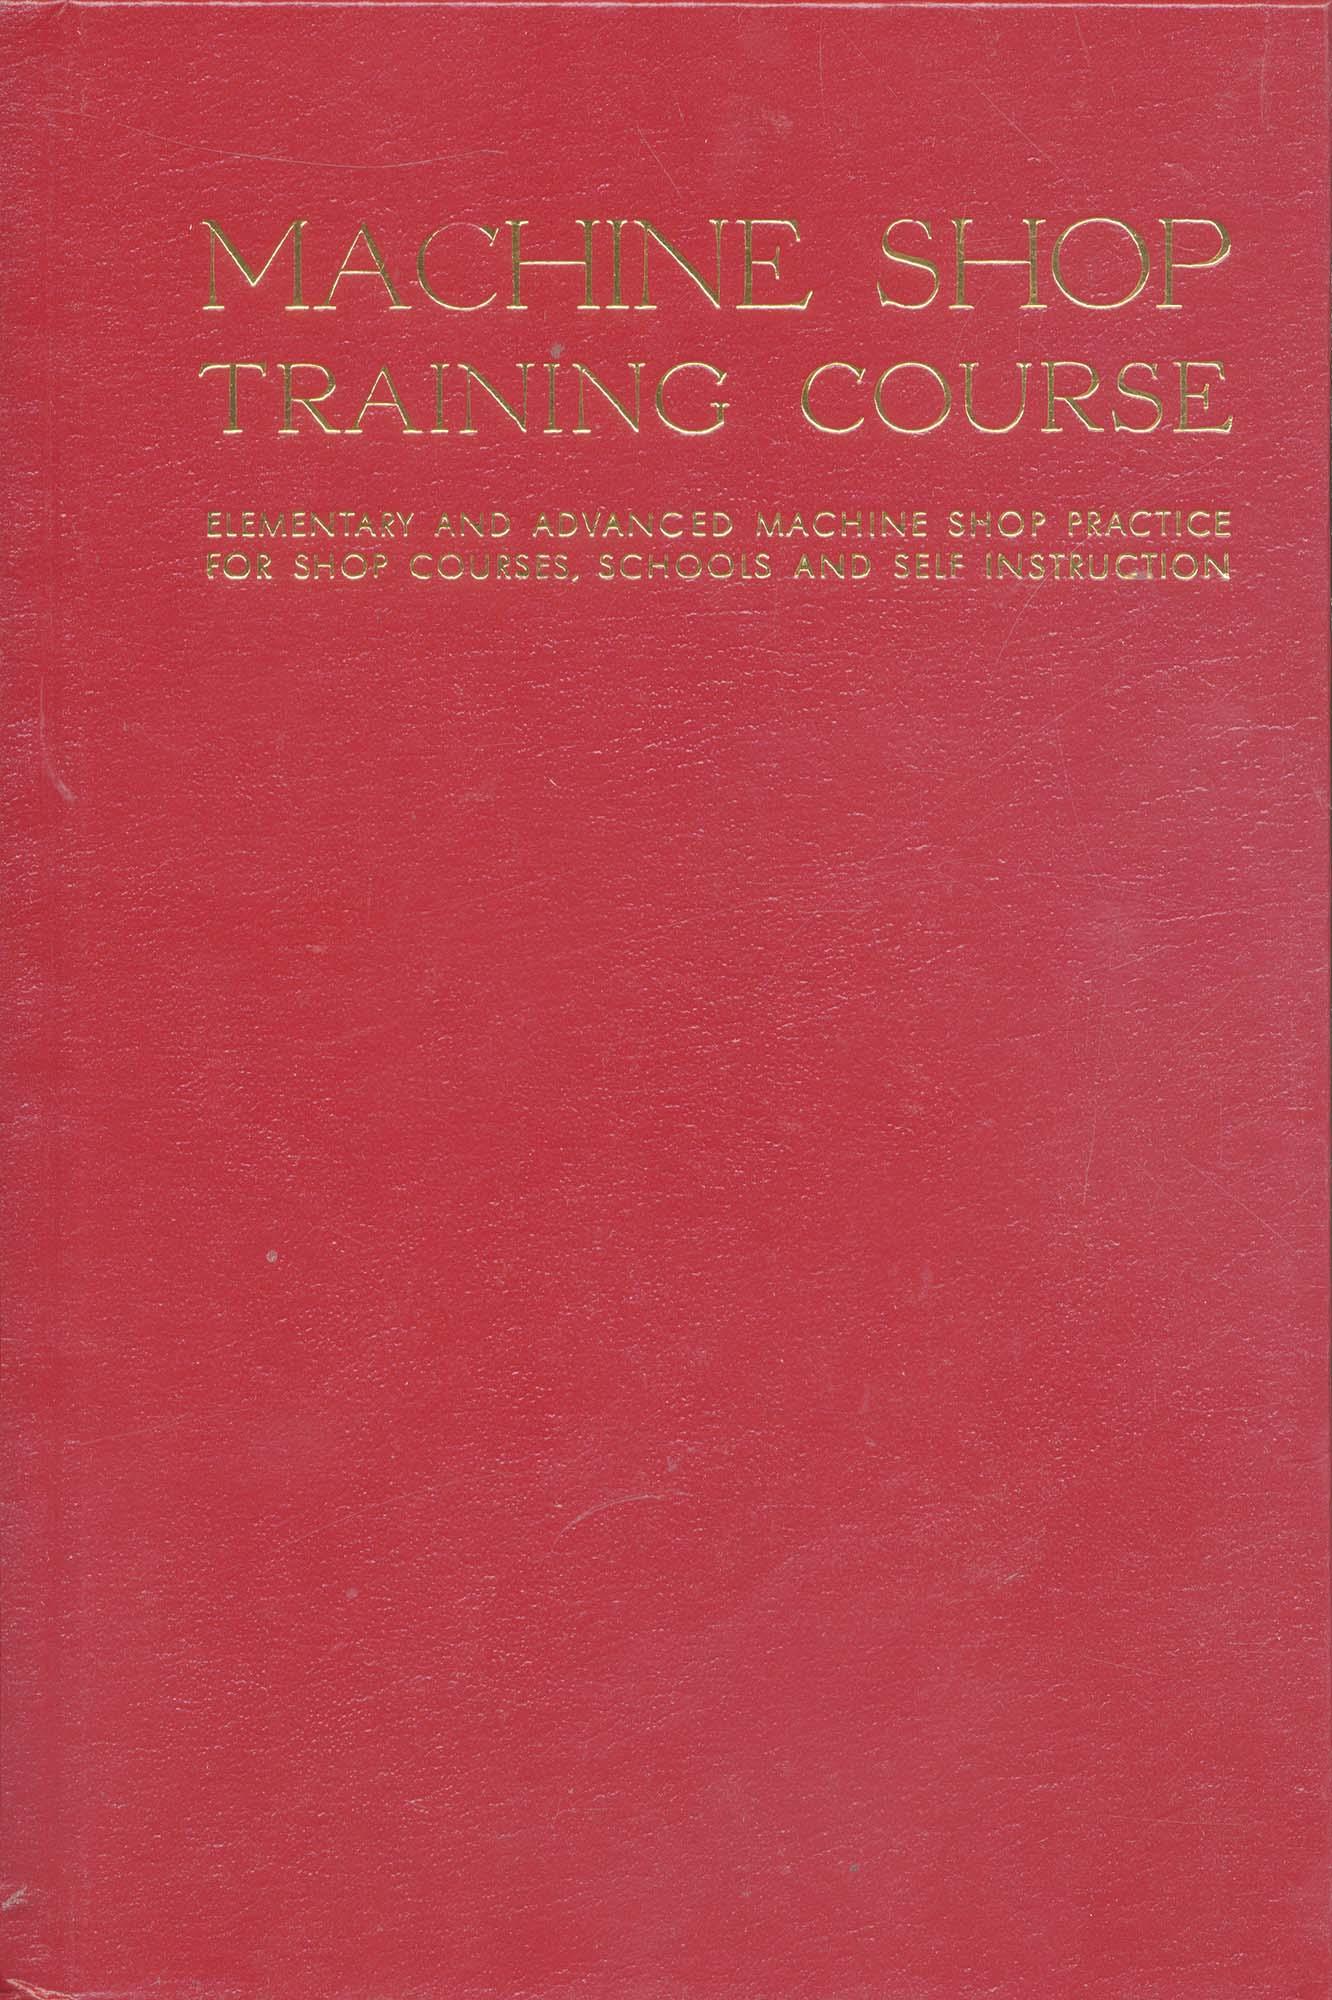 Book-Machine Shop Training Course, Volume 1